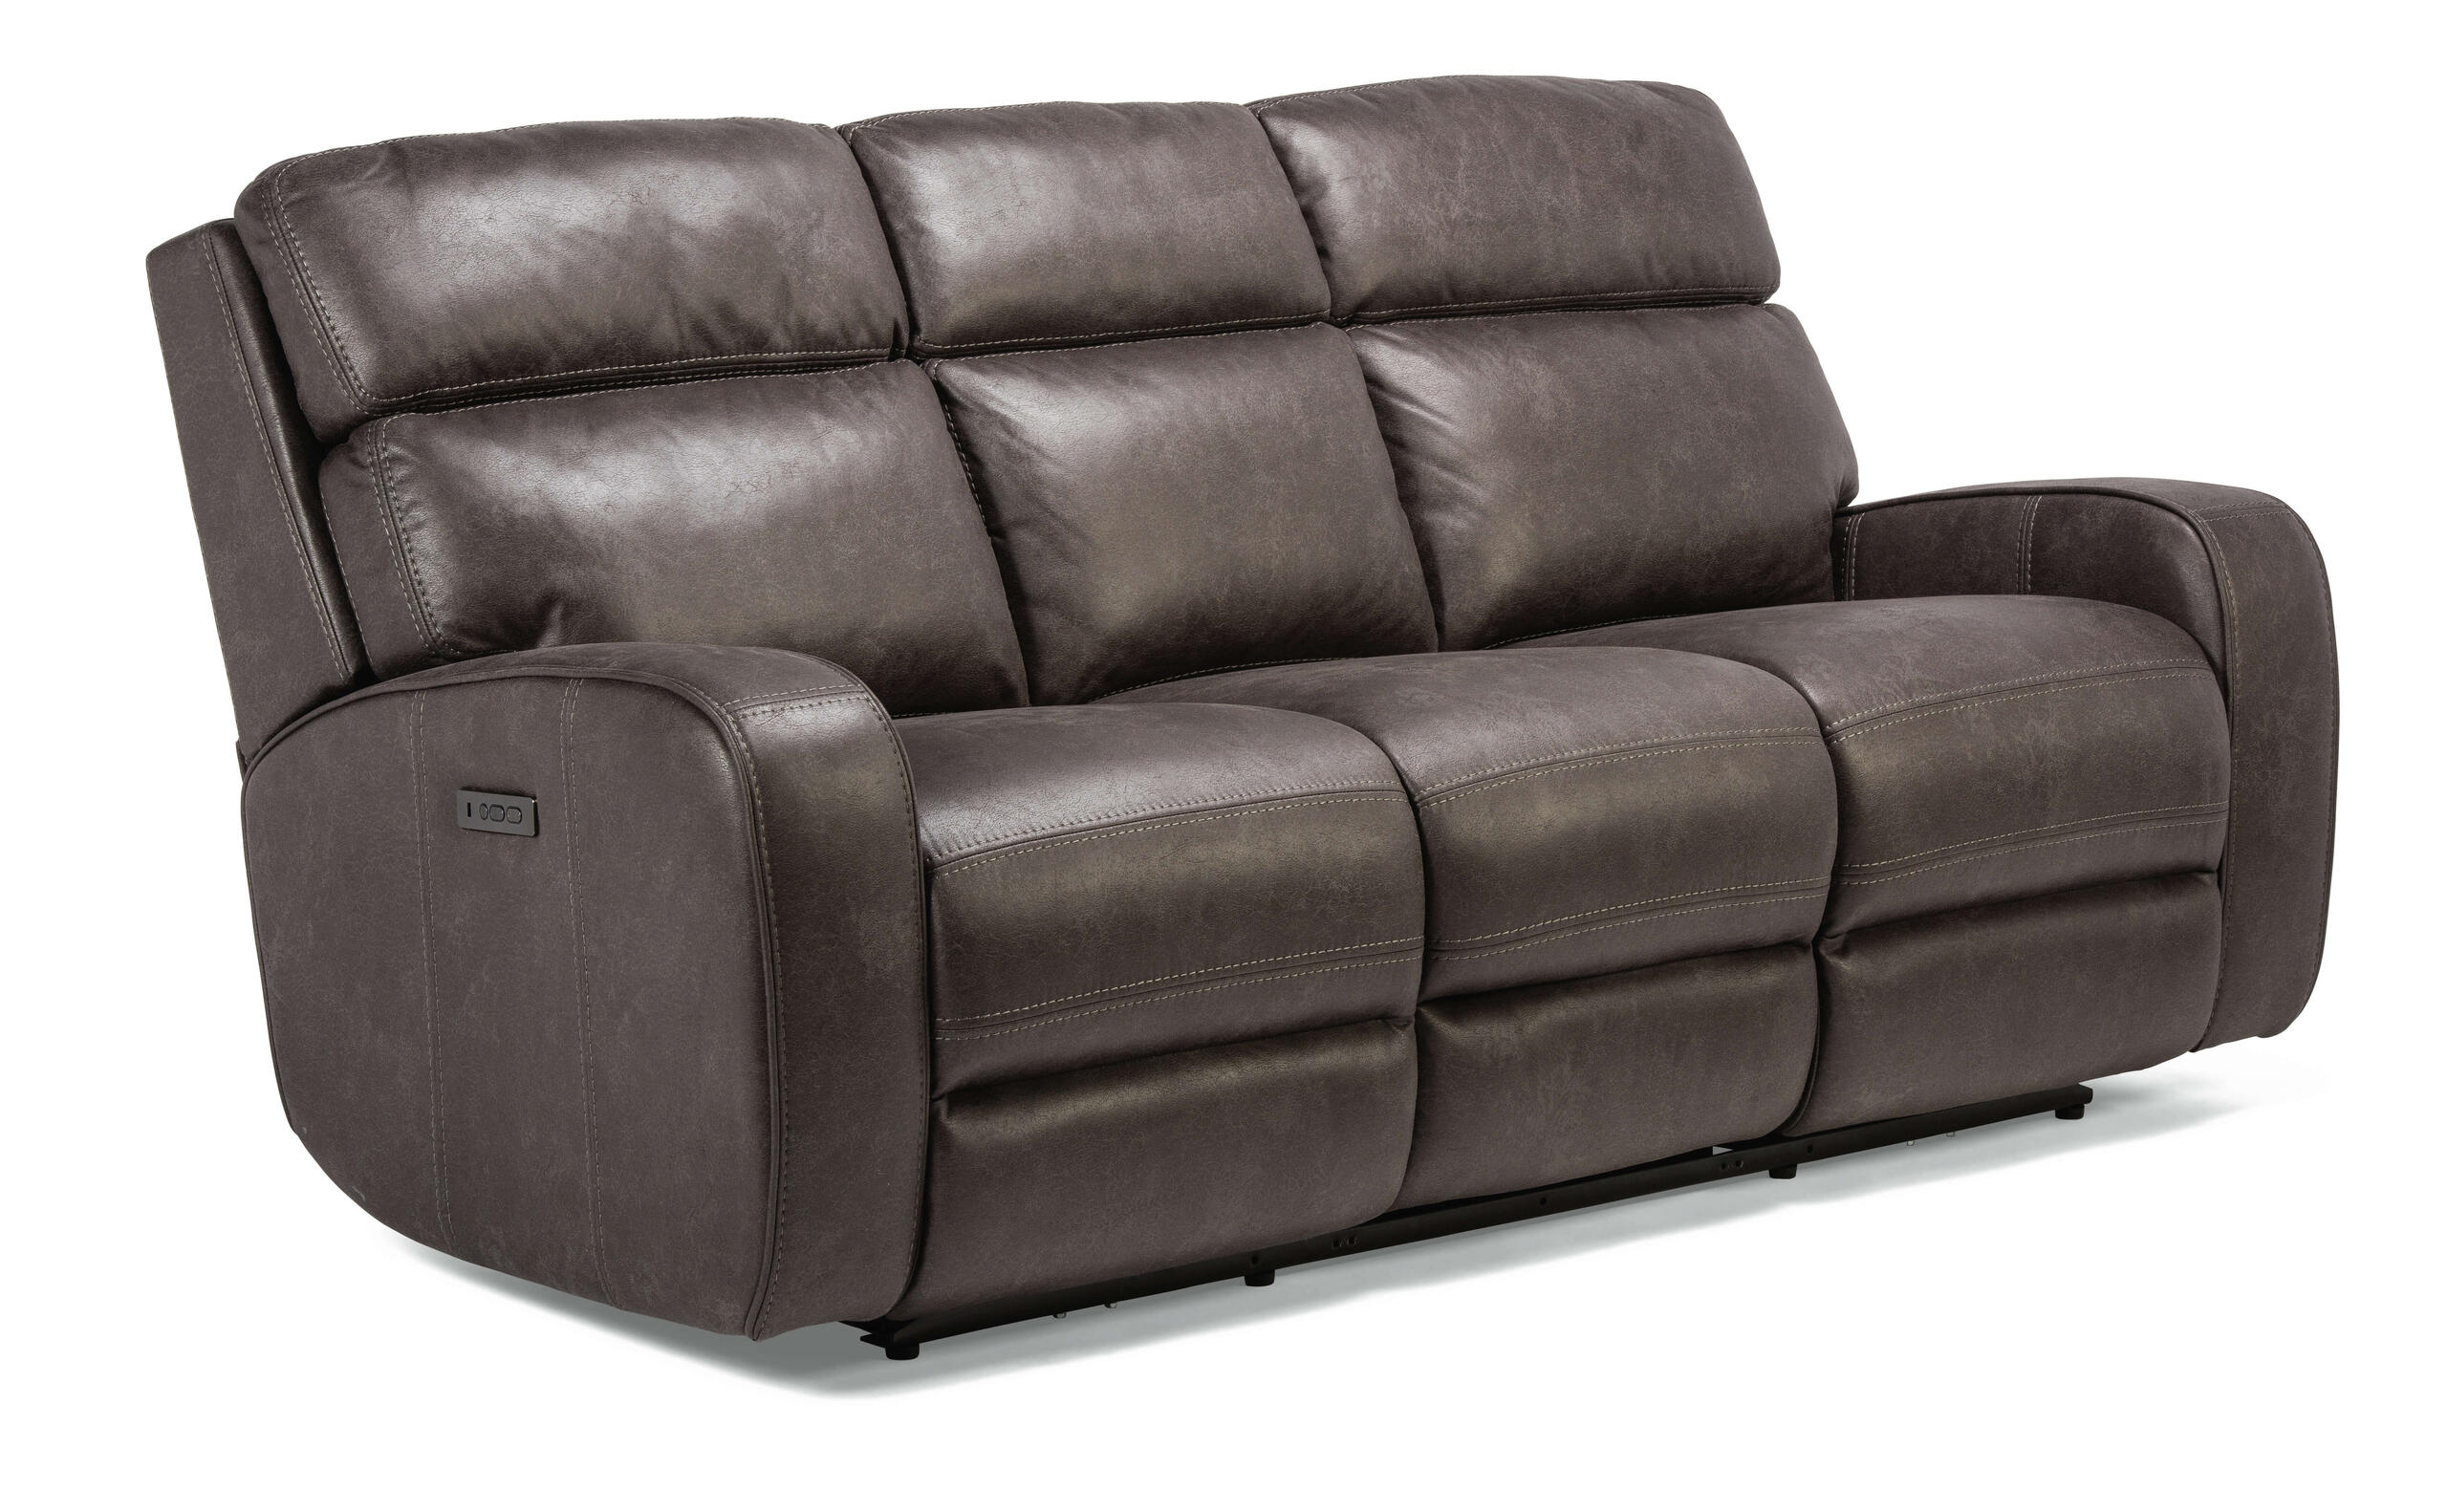 FlexsteelTomkins Park Power Reclining Sofa With Power Headrests